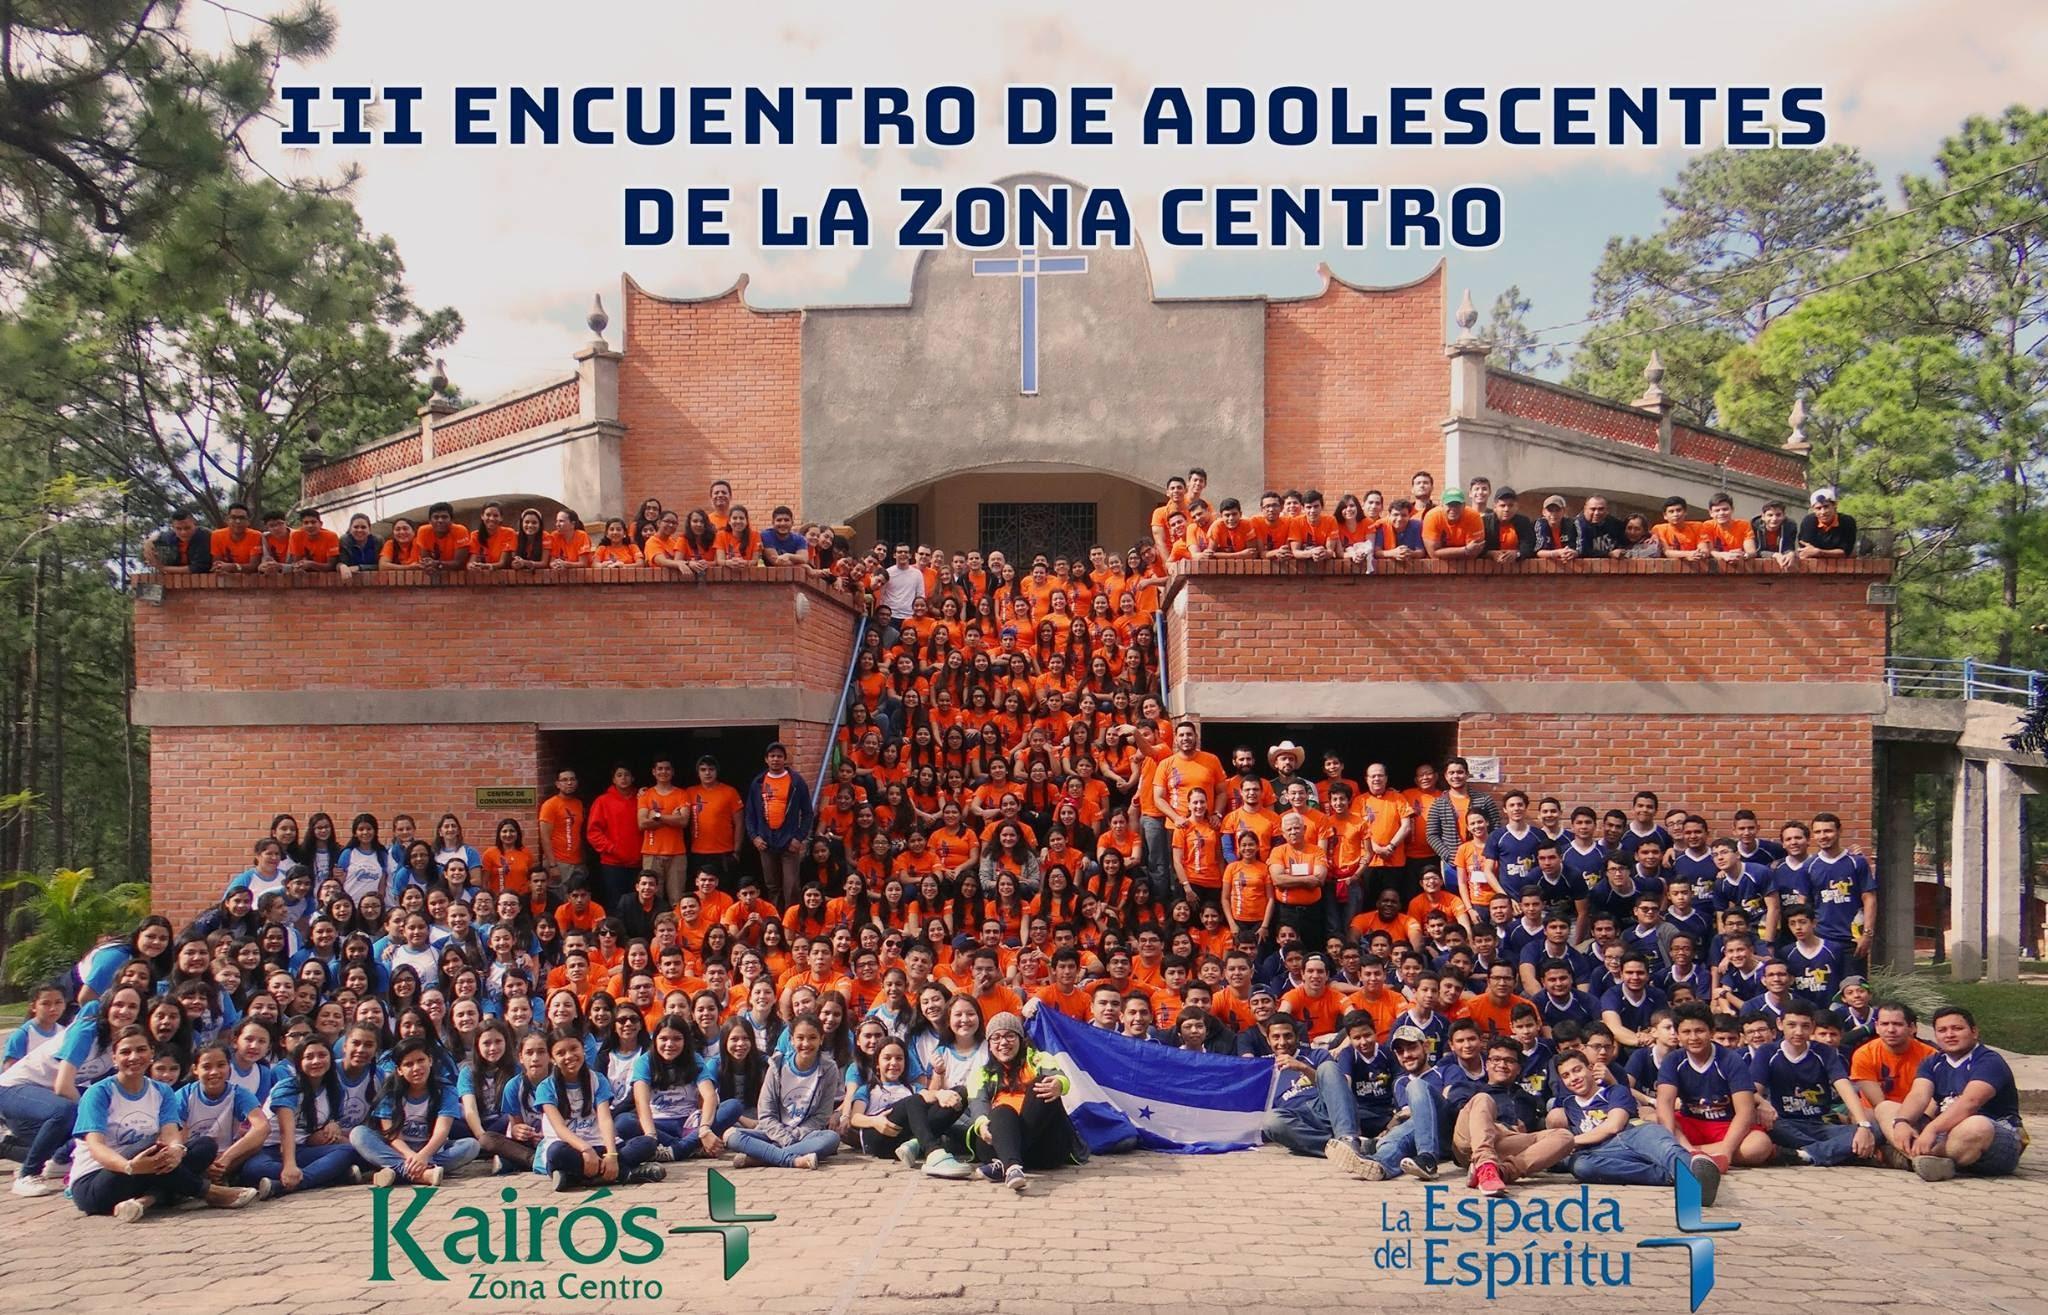 2016.01.4al8 - Conferencia Adolescentes en Tegucigalpa (Honduras) (11).jpg